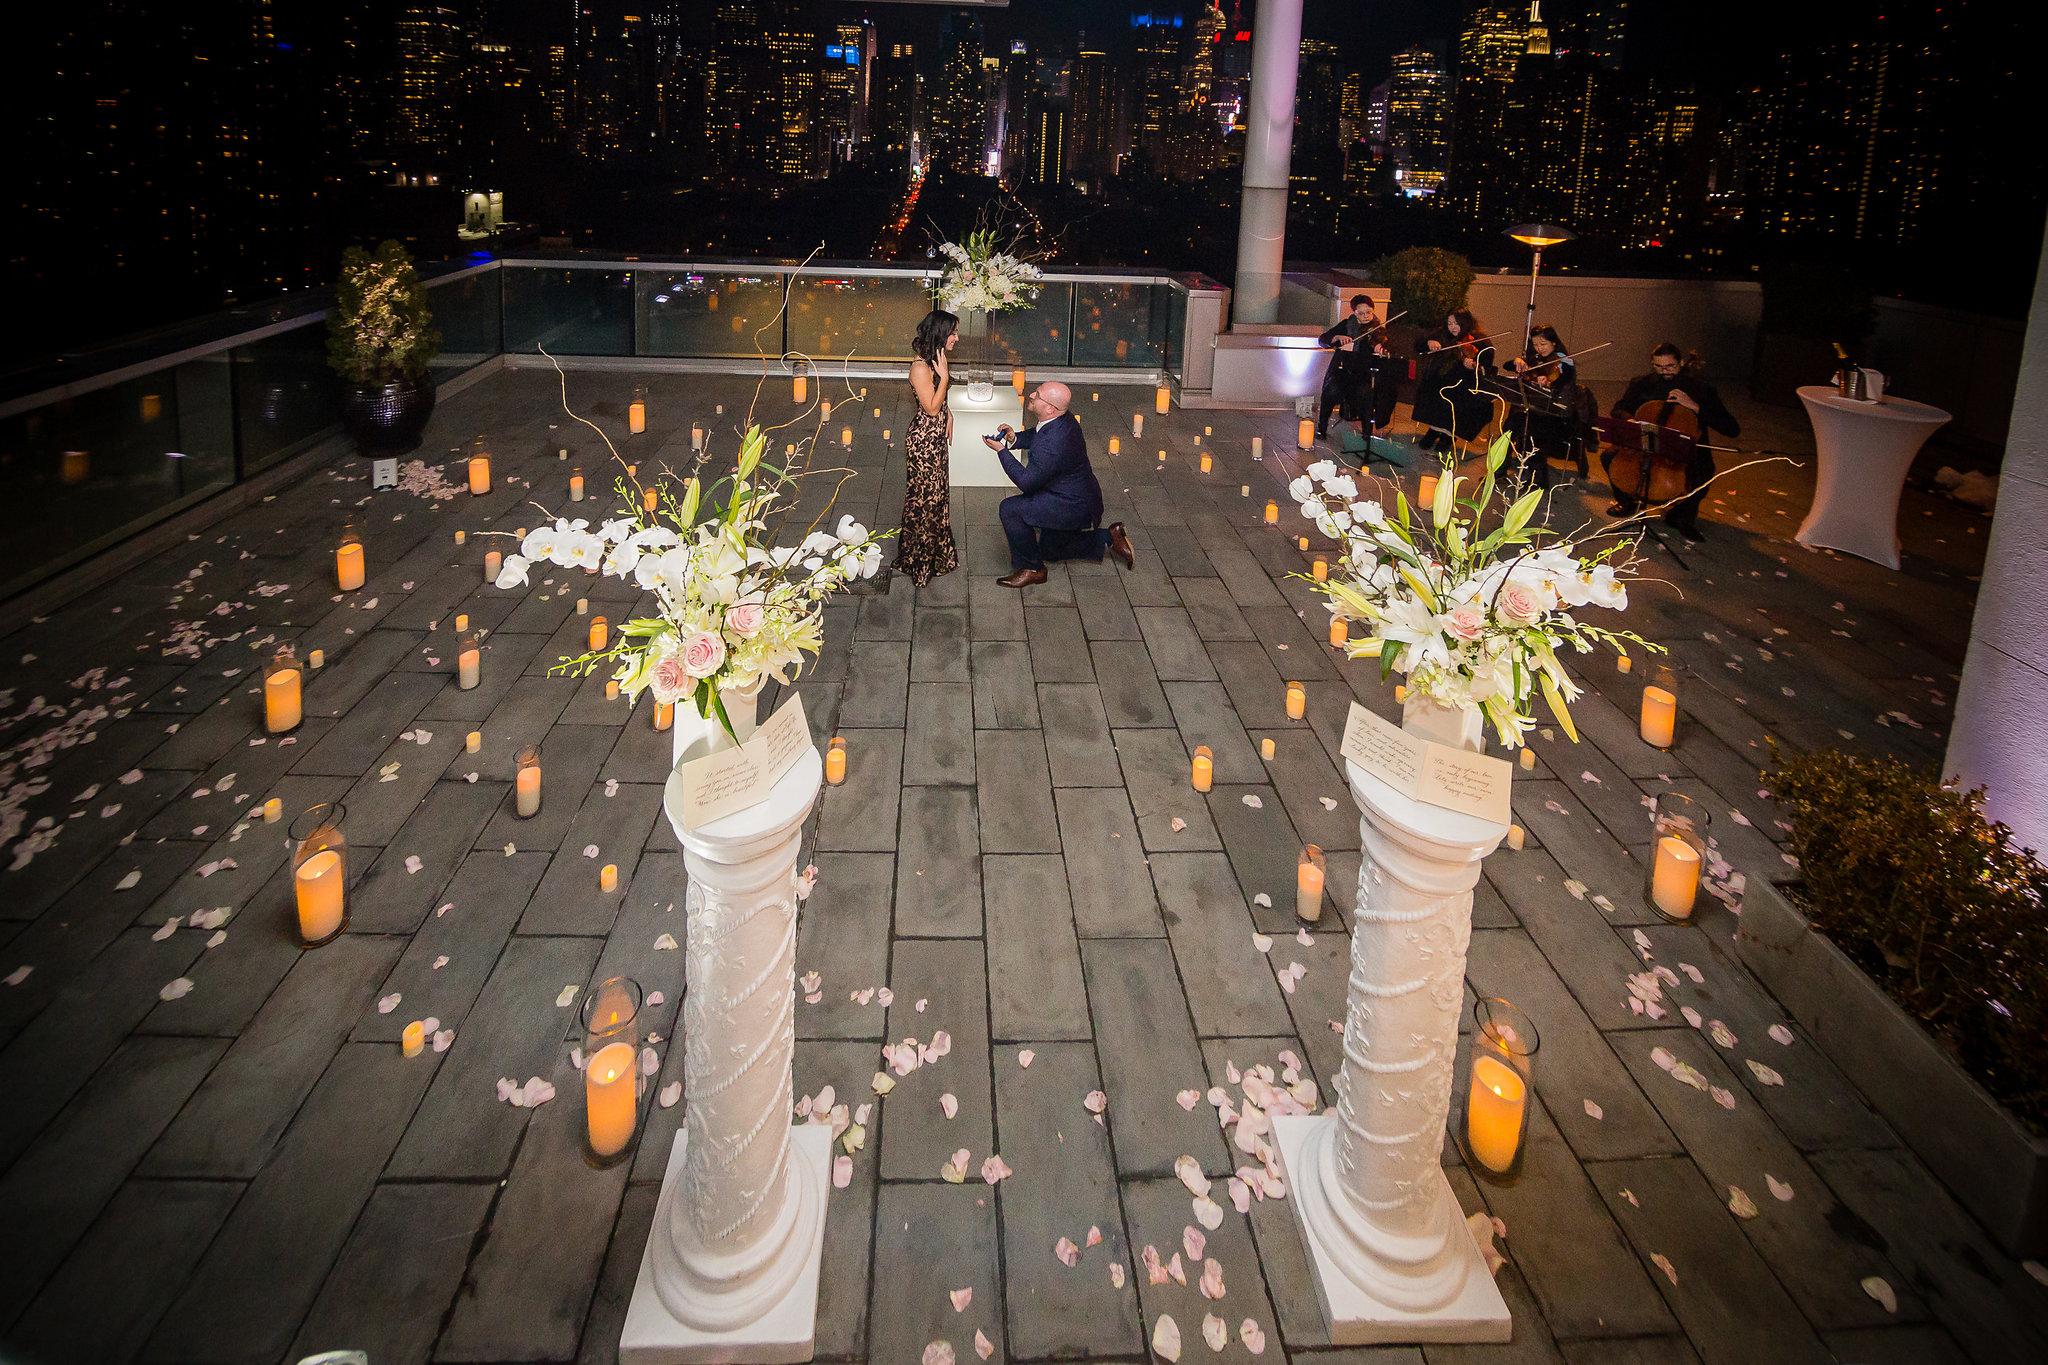 Kristina_Ben_marriage_proposal_Petronella_Photography_61.jpg